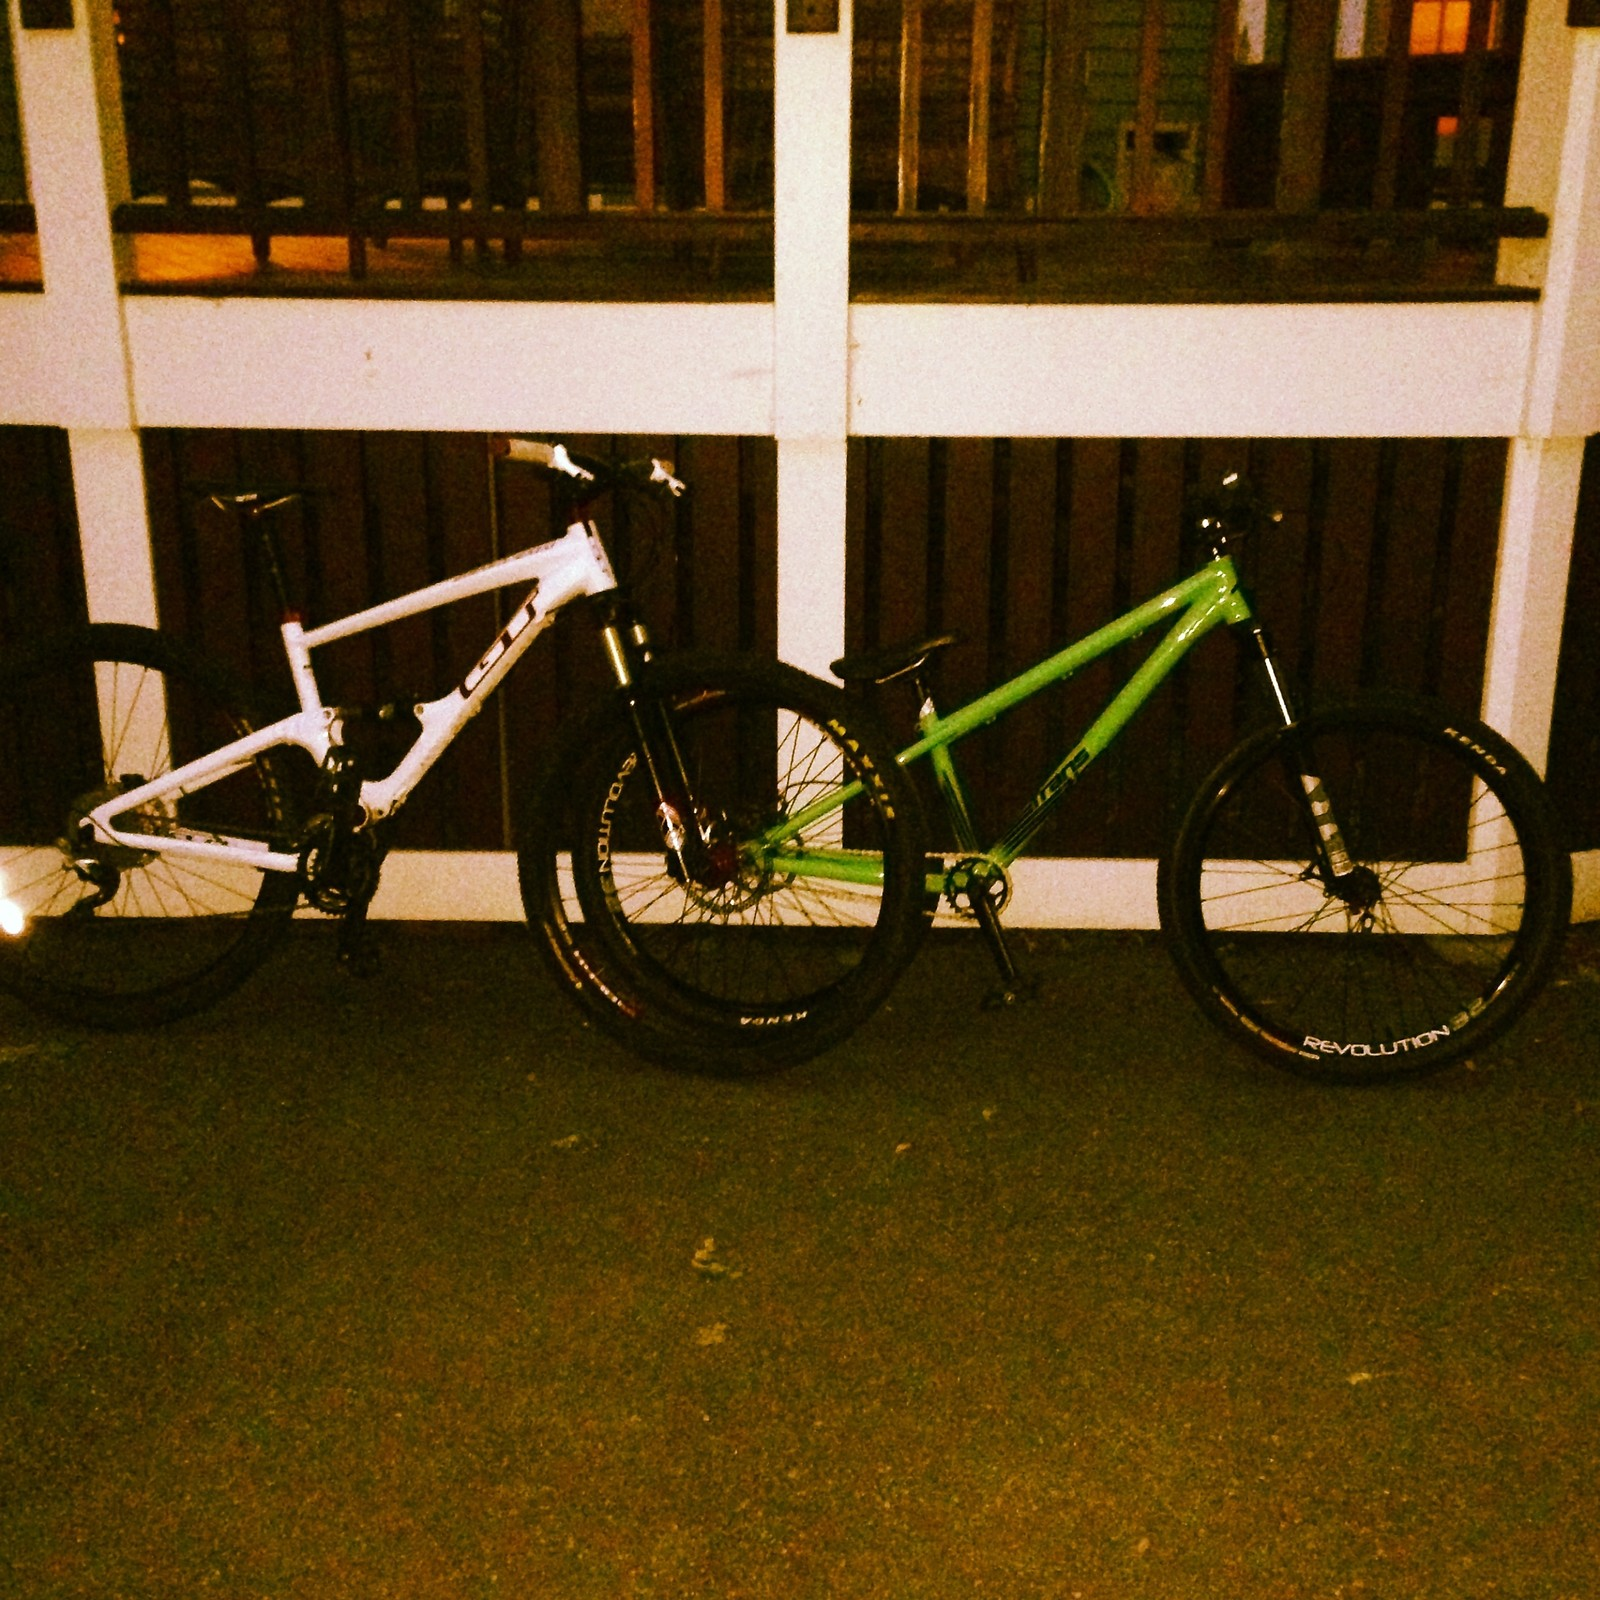 The bikes - DEscoll123 - Mountain Biking Pictures - Vital MTB